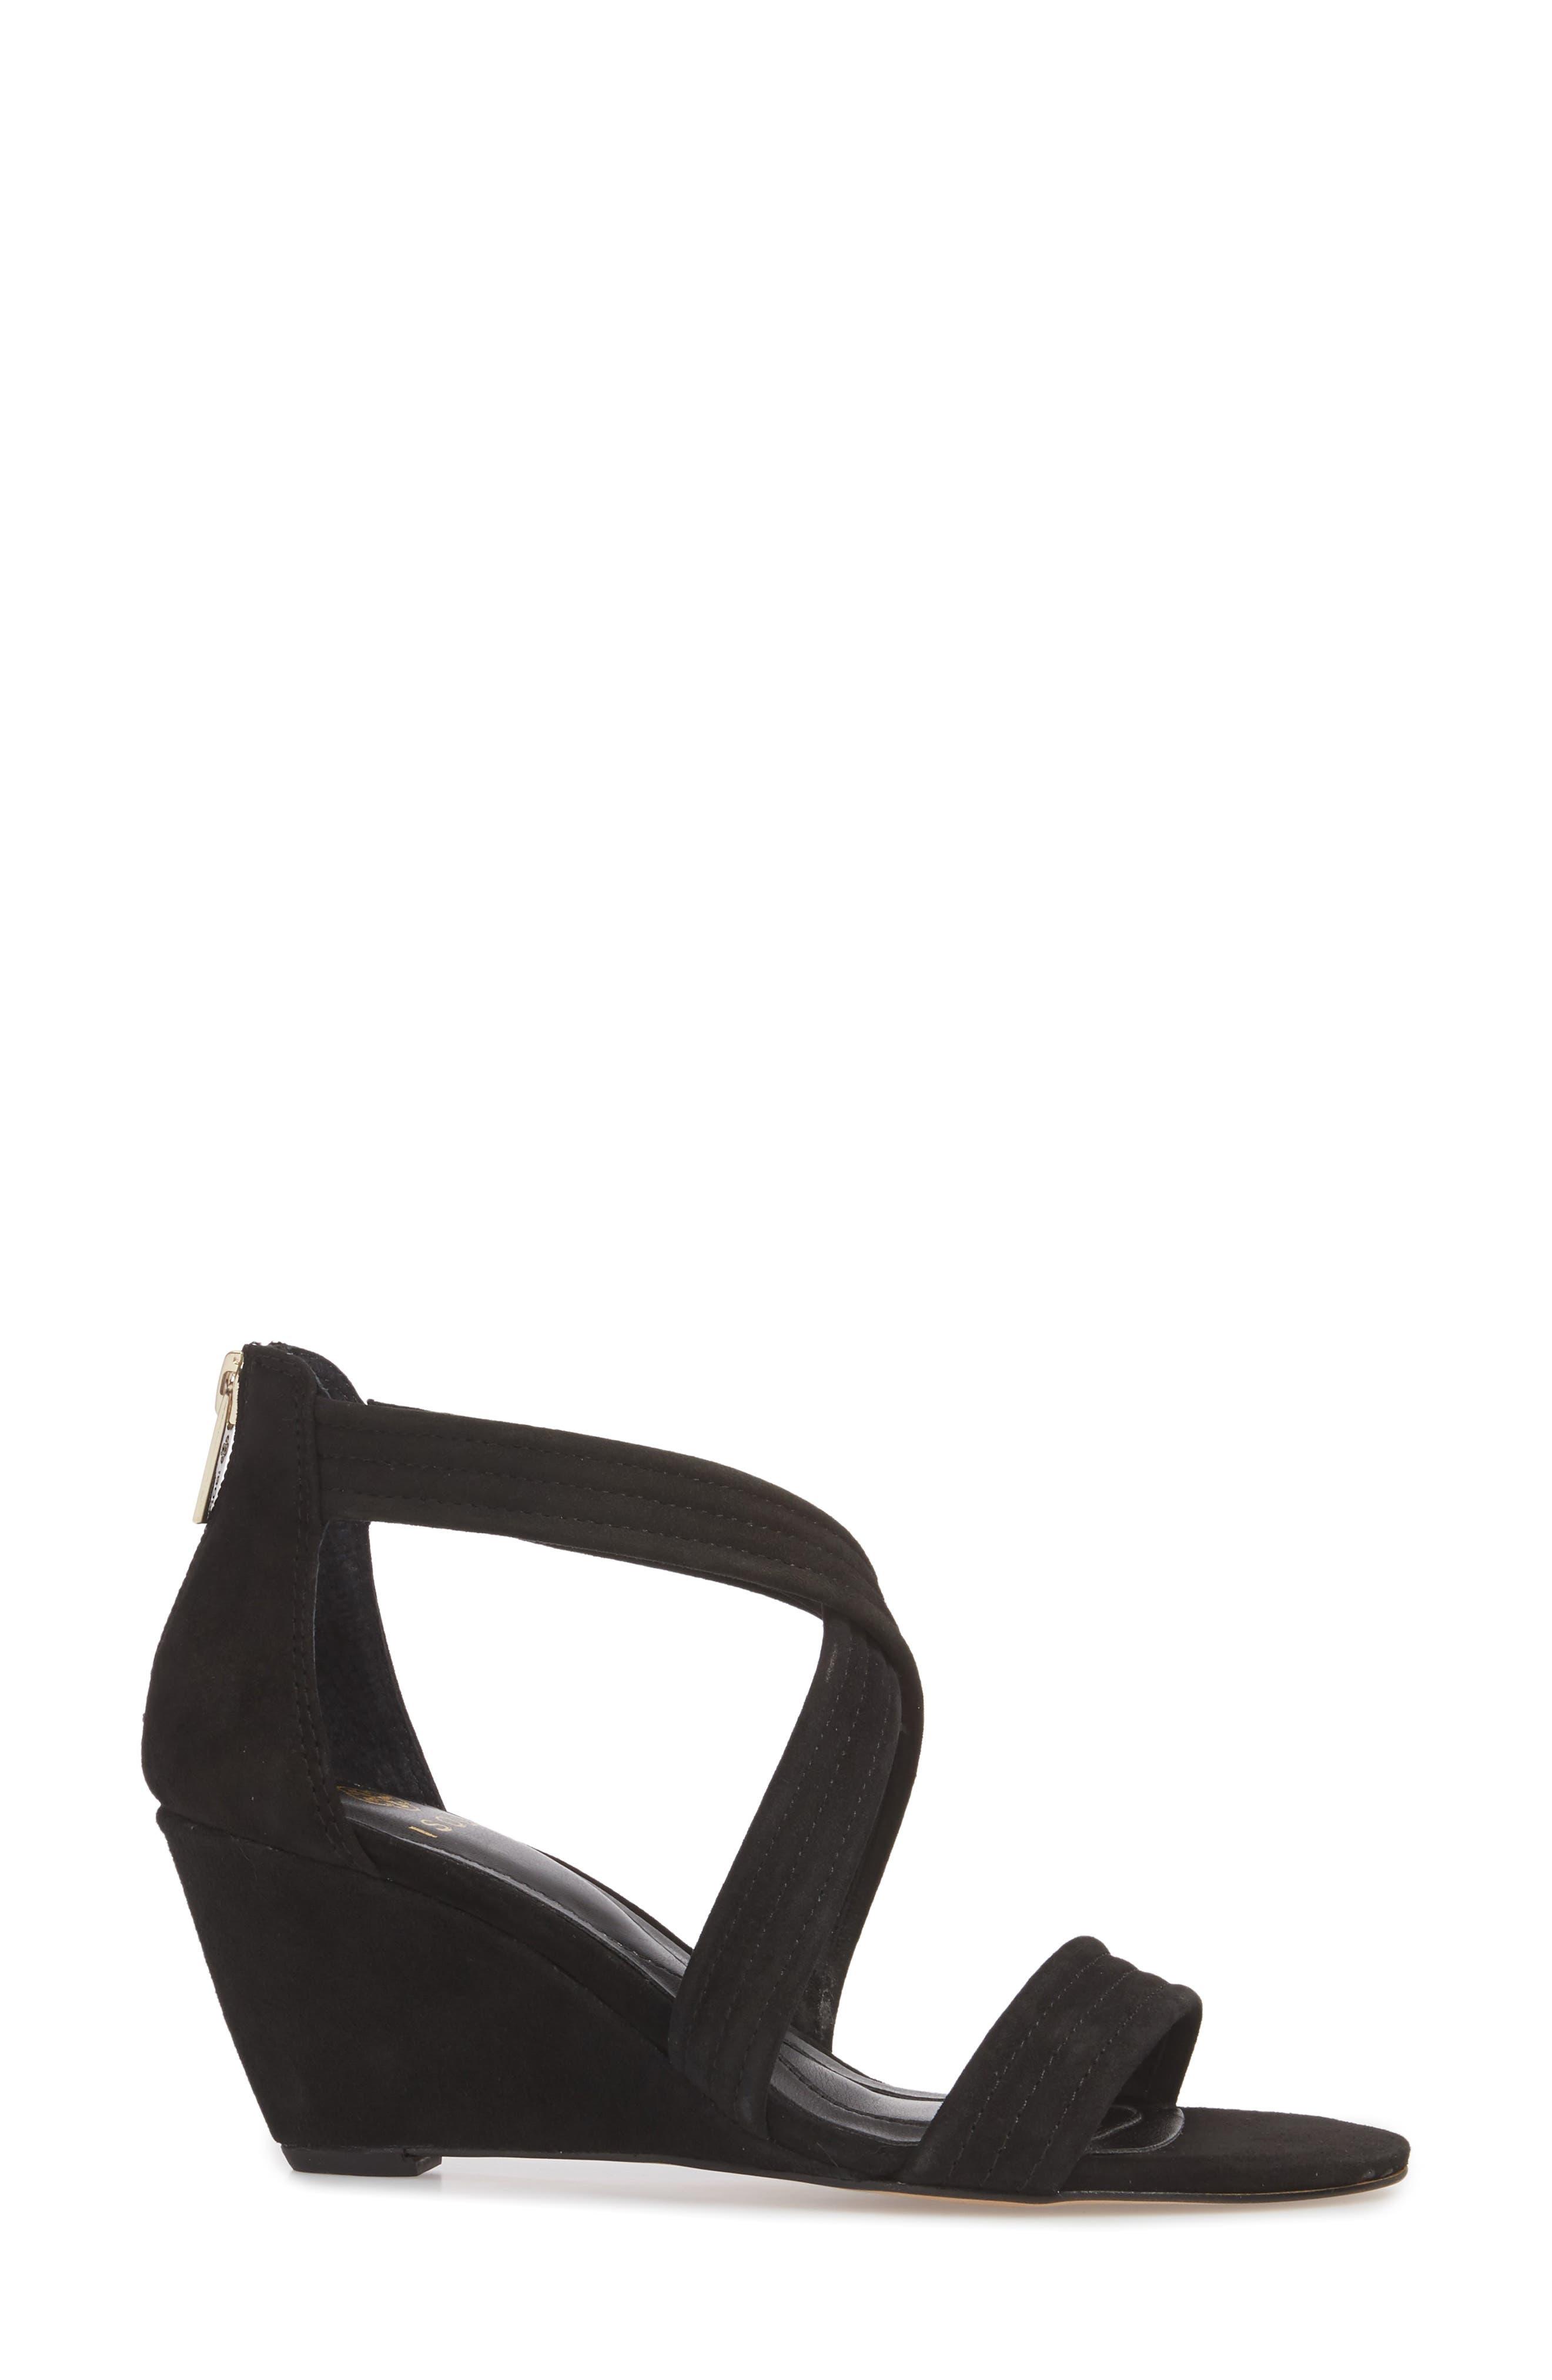 Fia Wedge Sandal,                             Alternate thumbnail 3, color,                             BLACK SUEDE